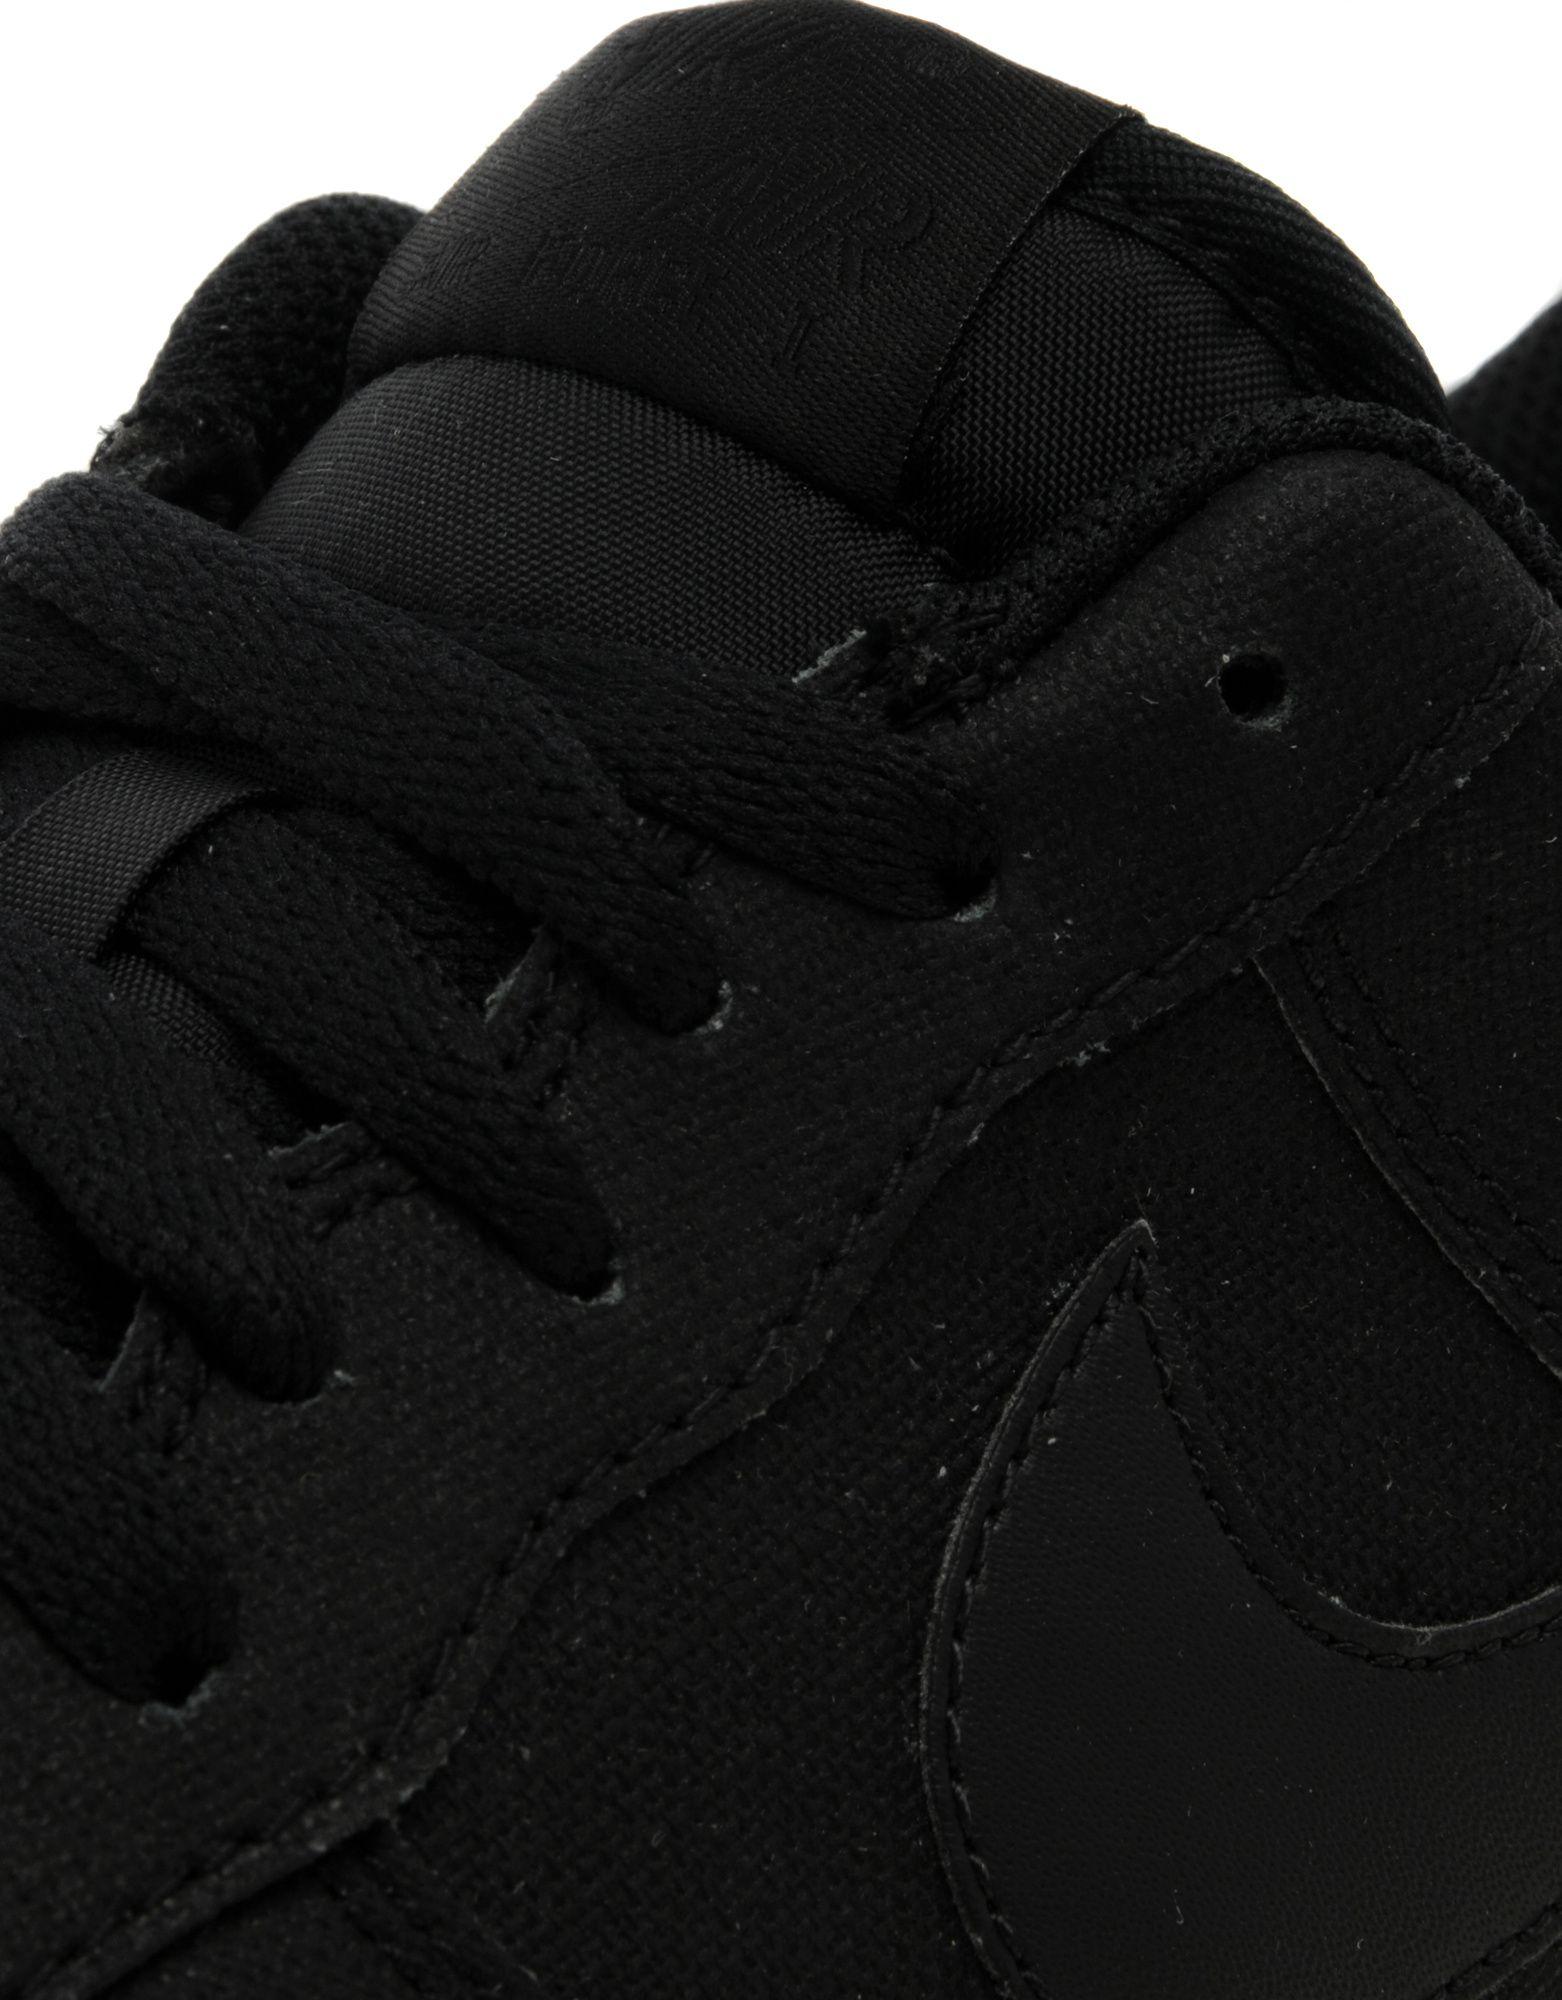 Nike Air Force 1 'TecTuff'